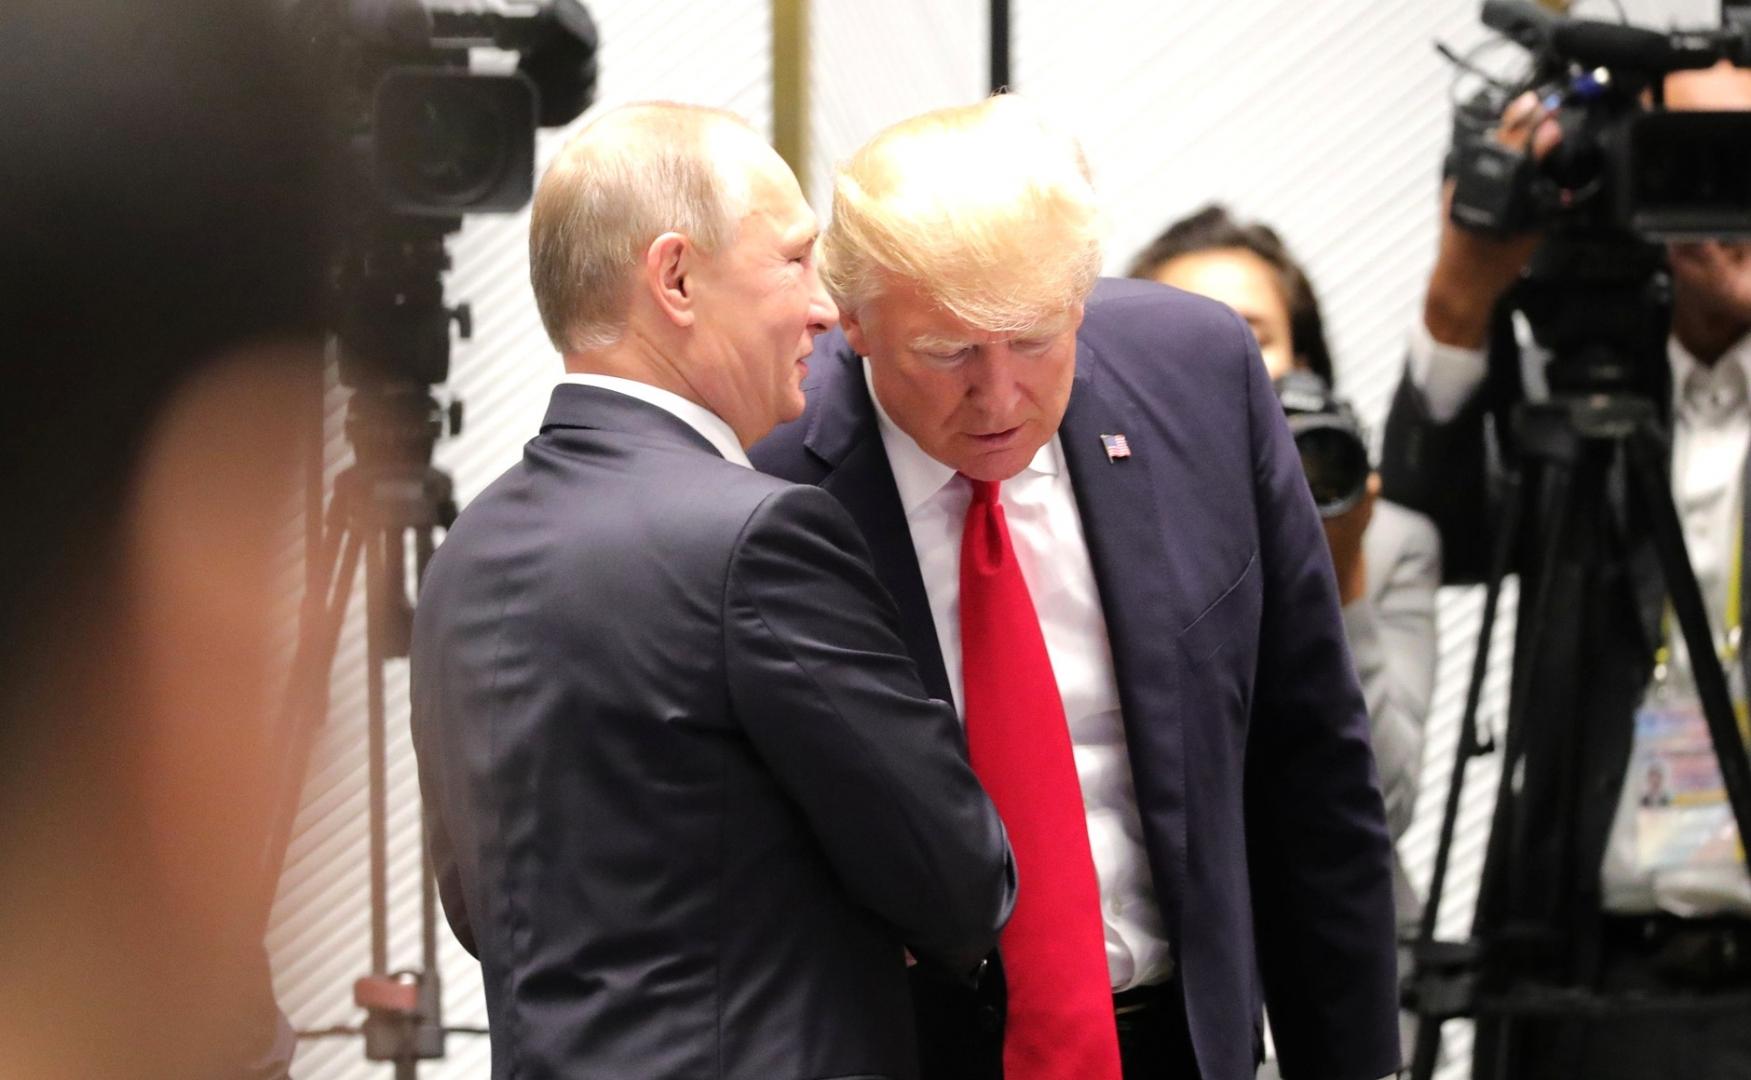 Встреча Президента России Владимира Путина и Президента США Дональда Трампа. Дананг. 2017